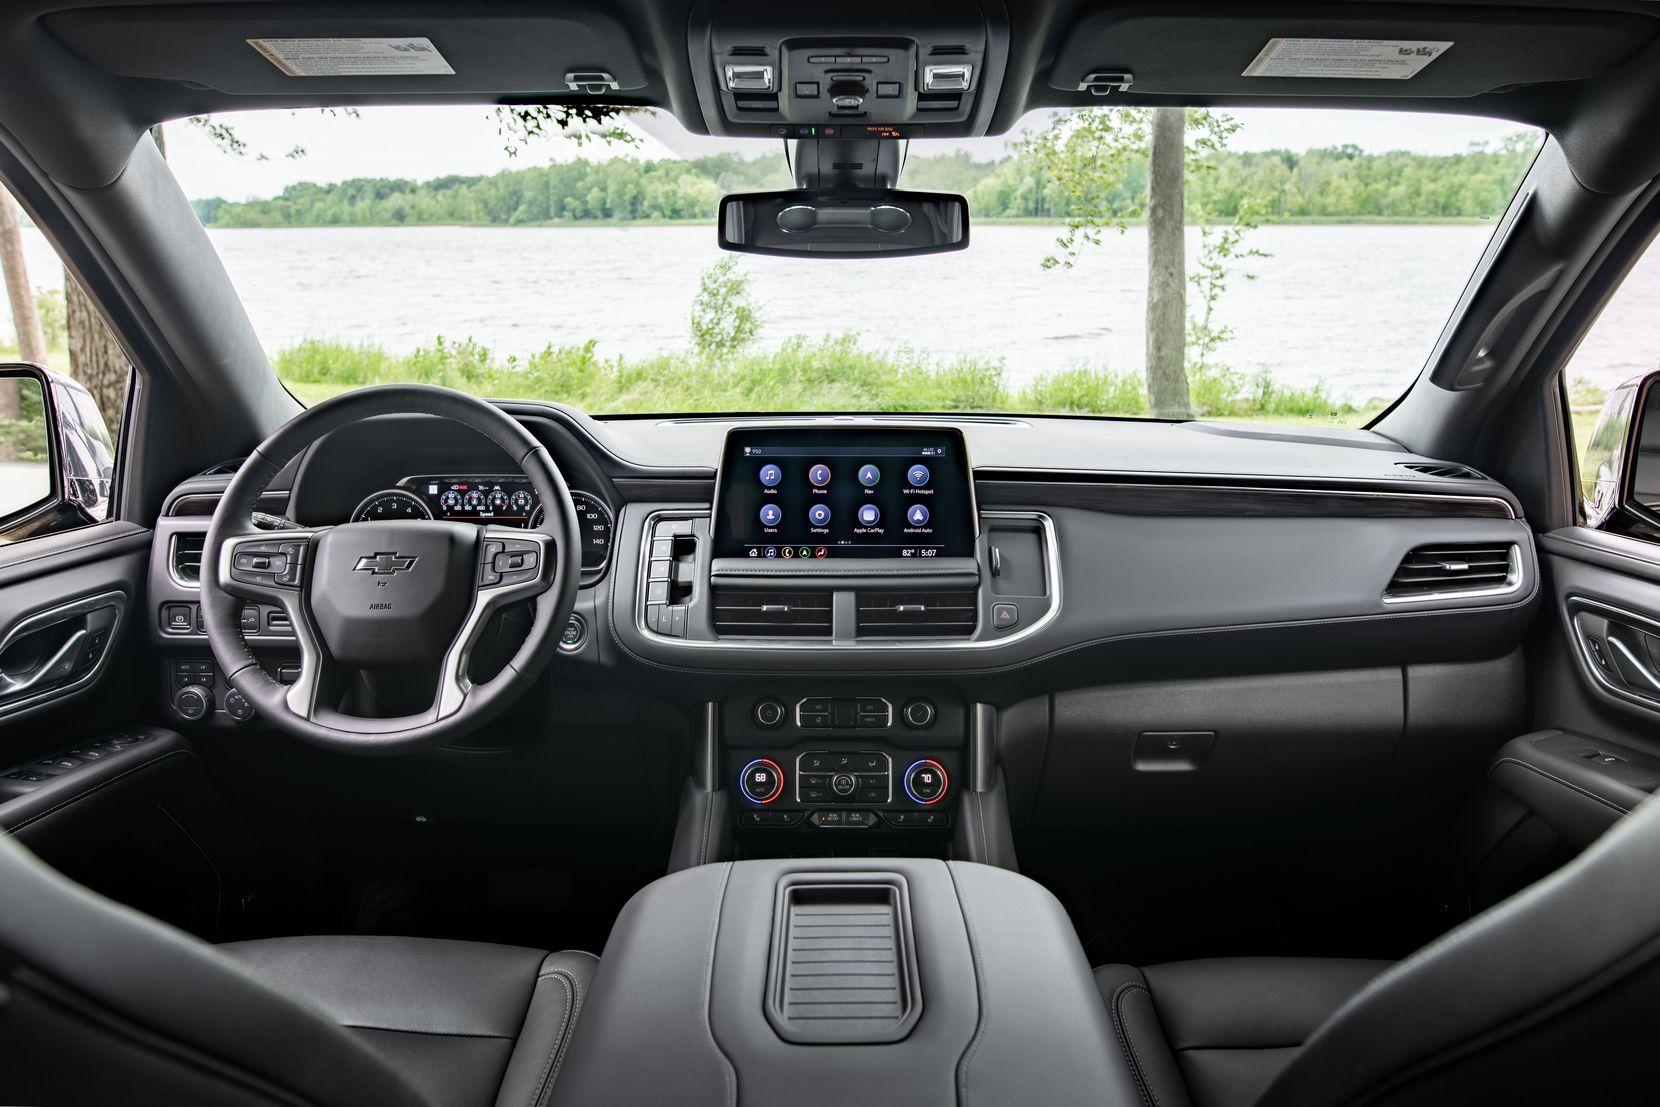 2021 Chevrolet Suburban dashboard.